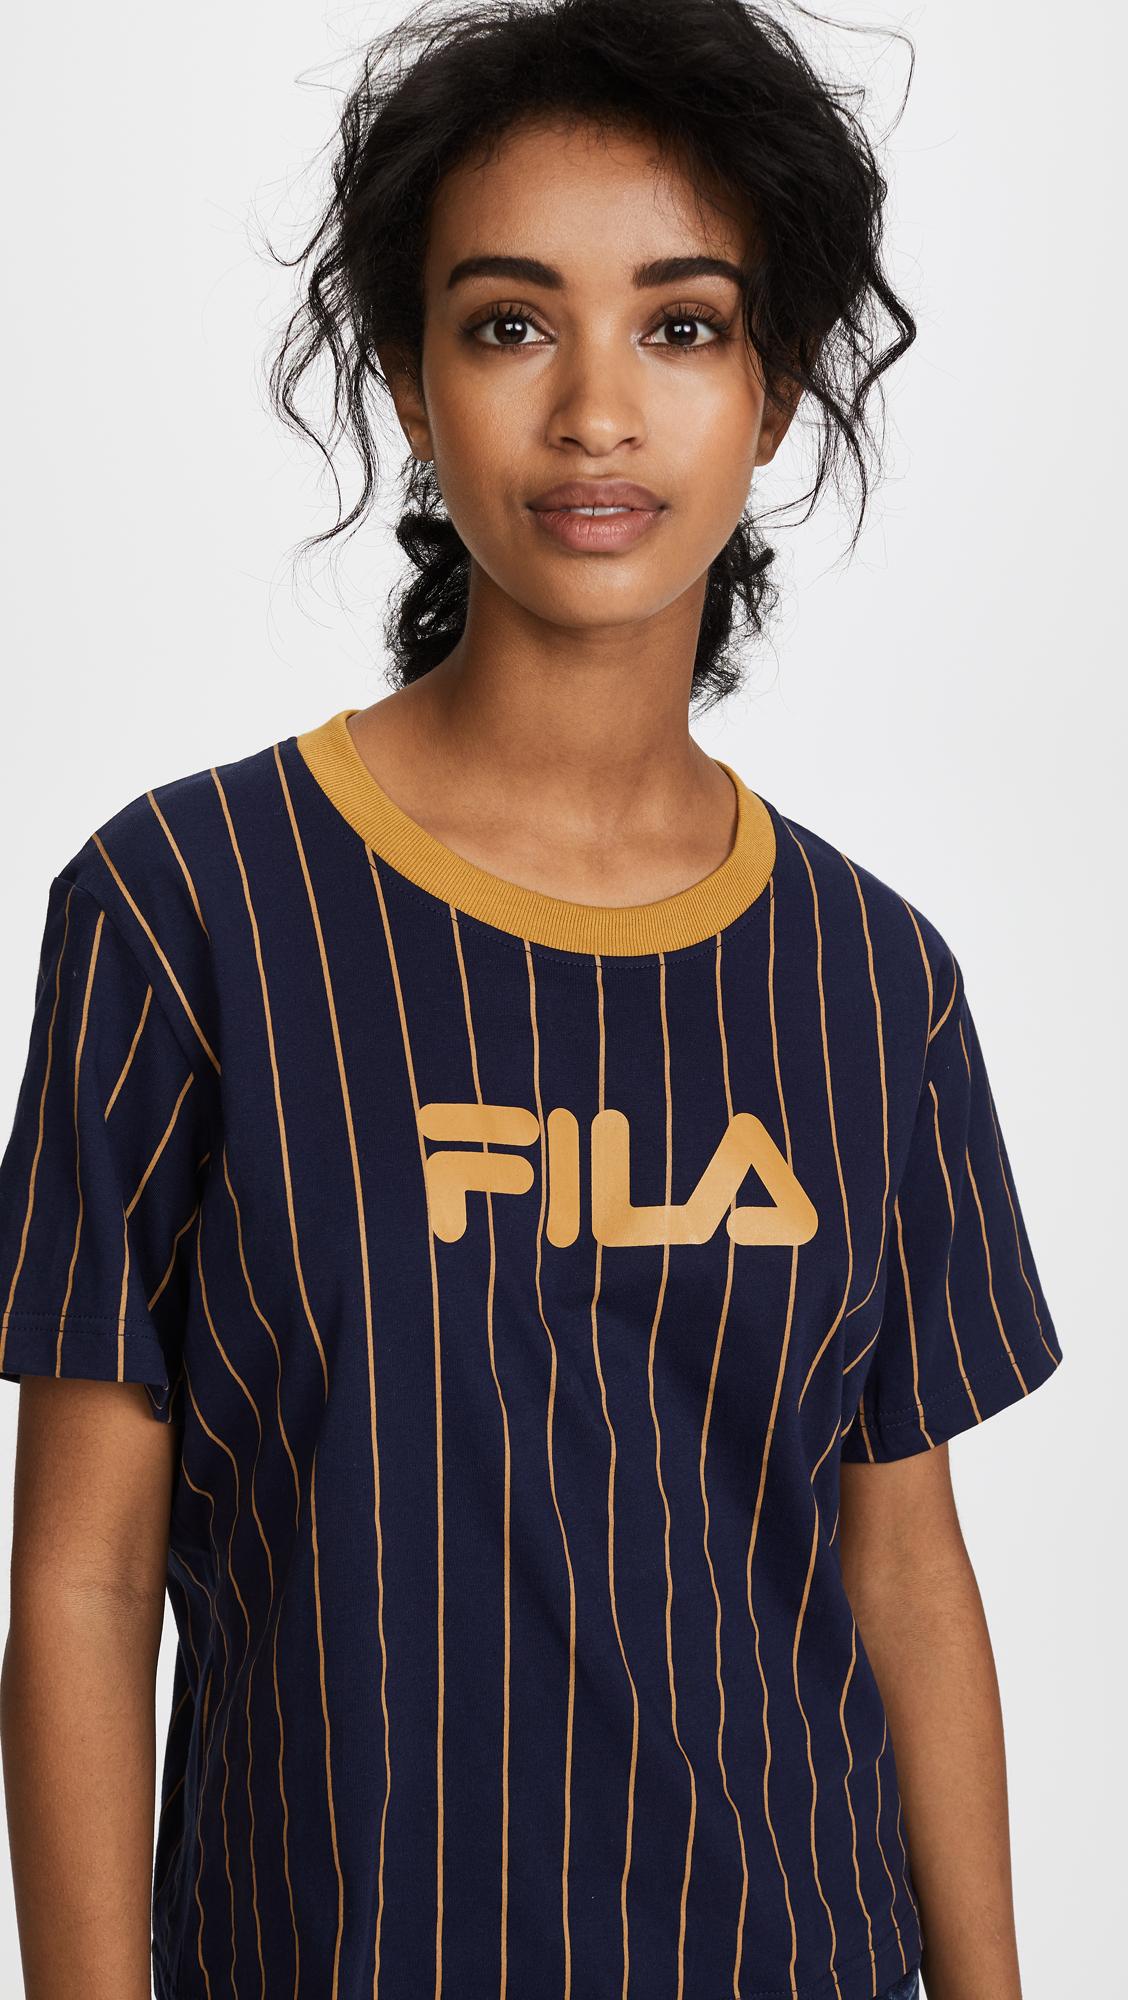 b1879c805cda22 Fila Lonnie Pinstripe T-Shirt